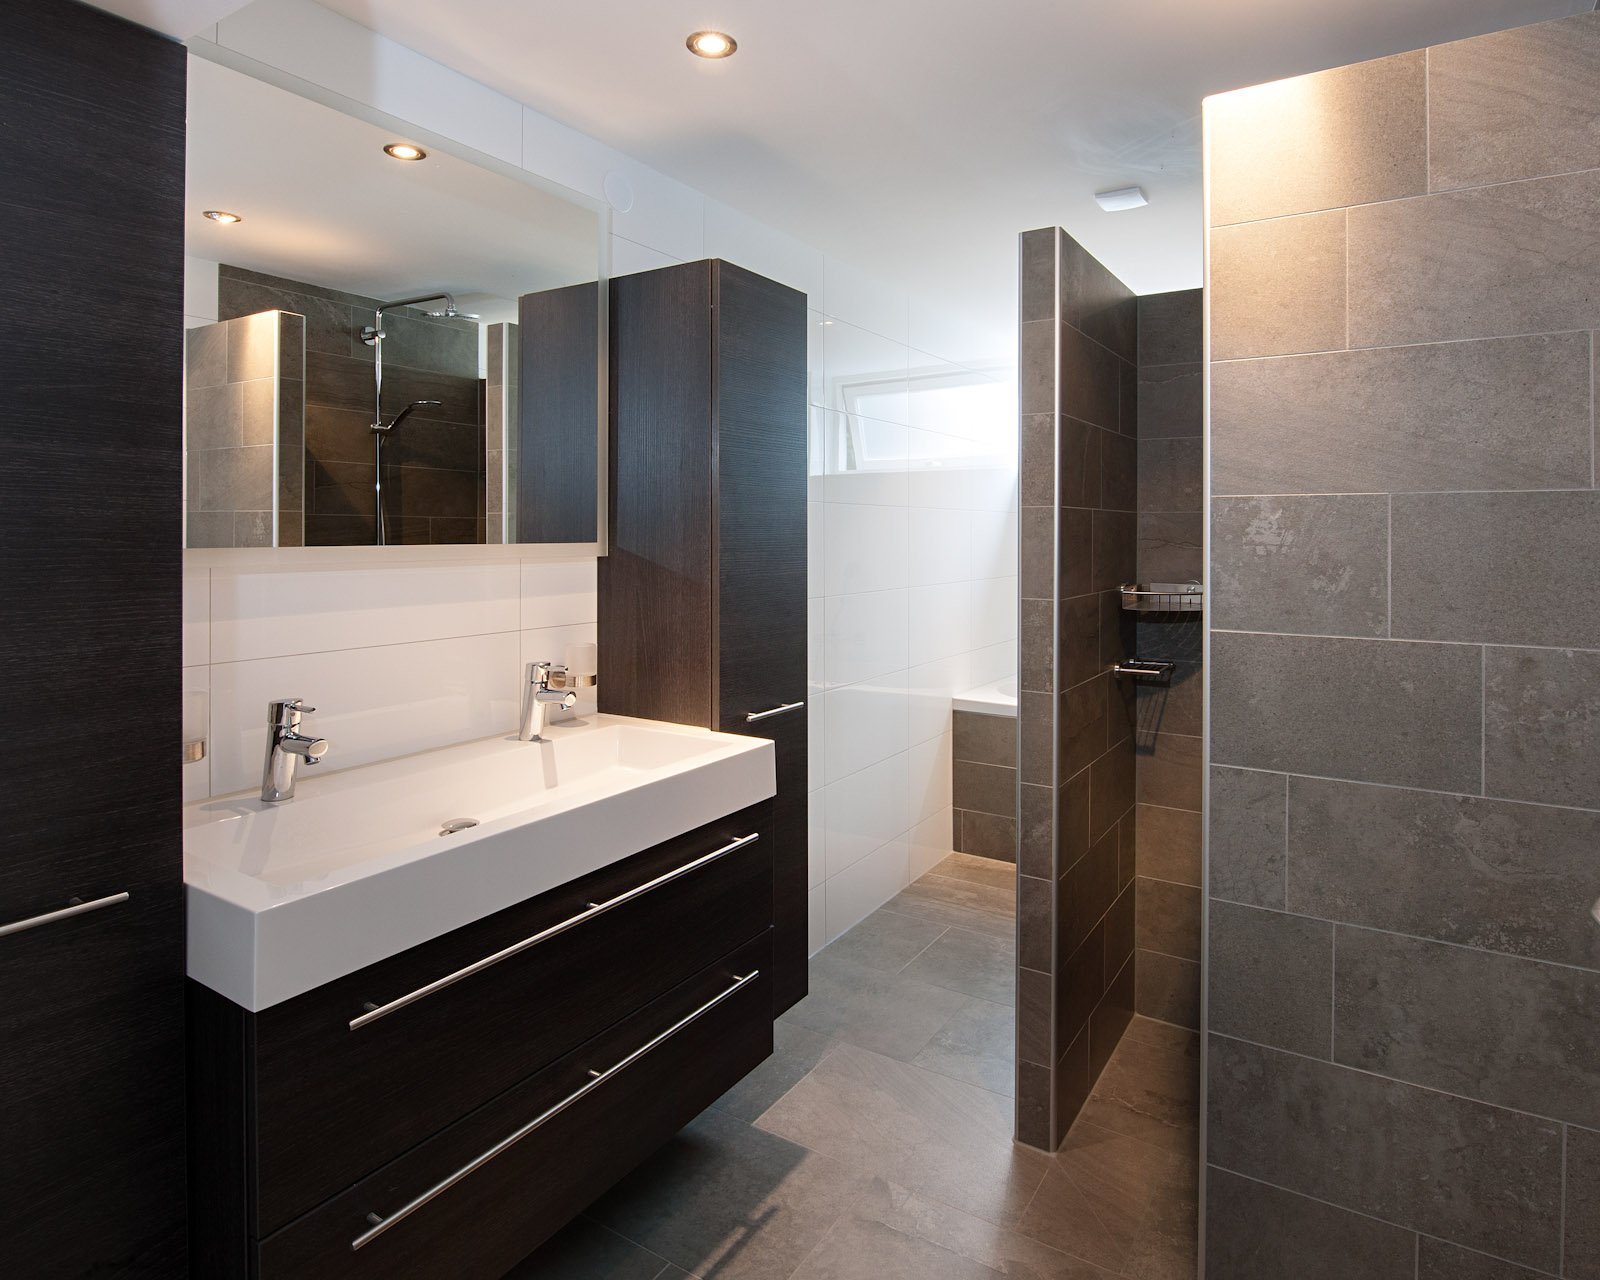 Keuken Badkamer Vloeren : Wandtegels badkamer kroon vloer in steen